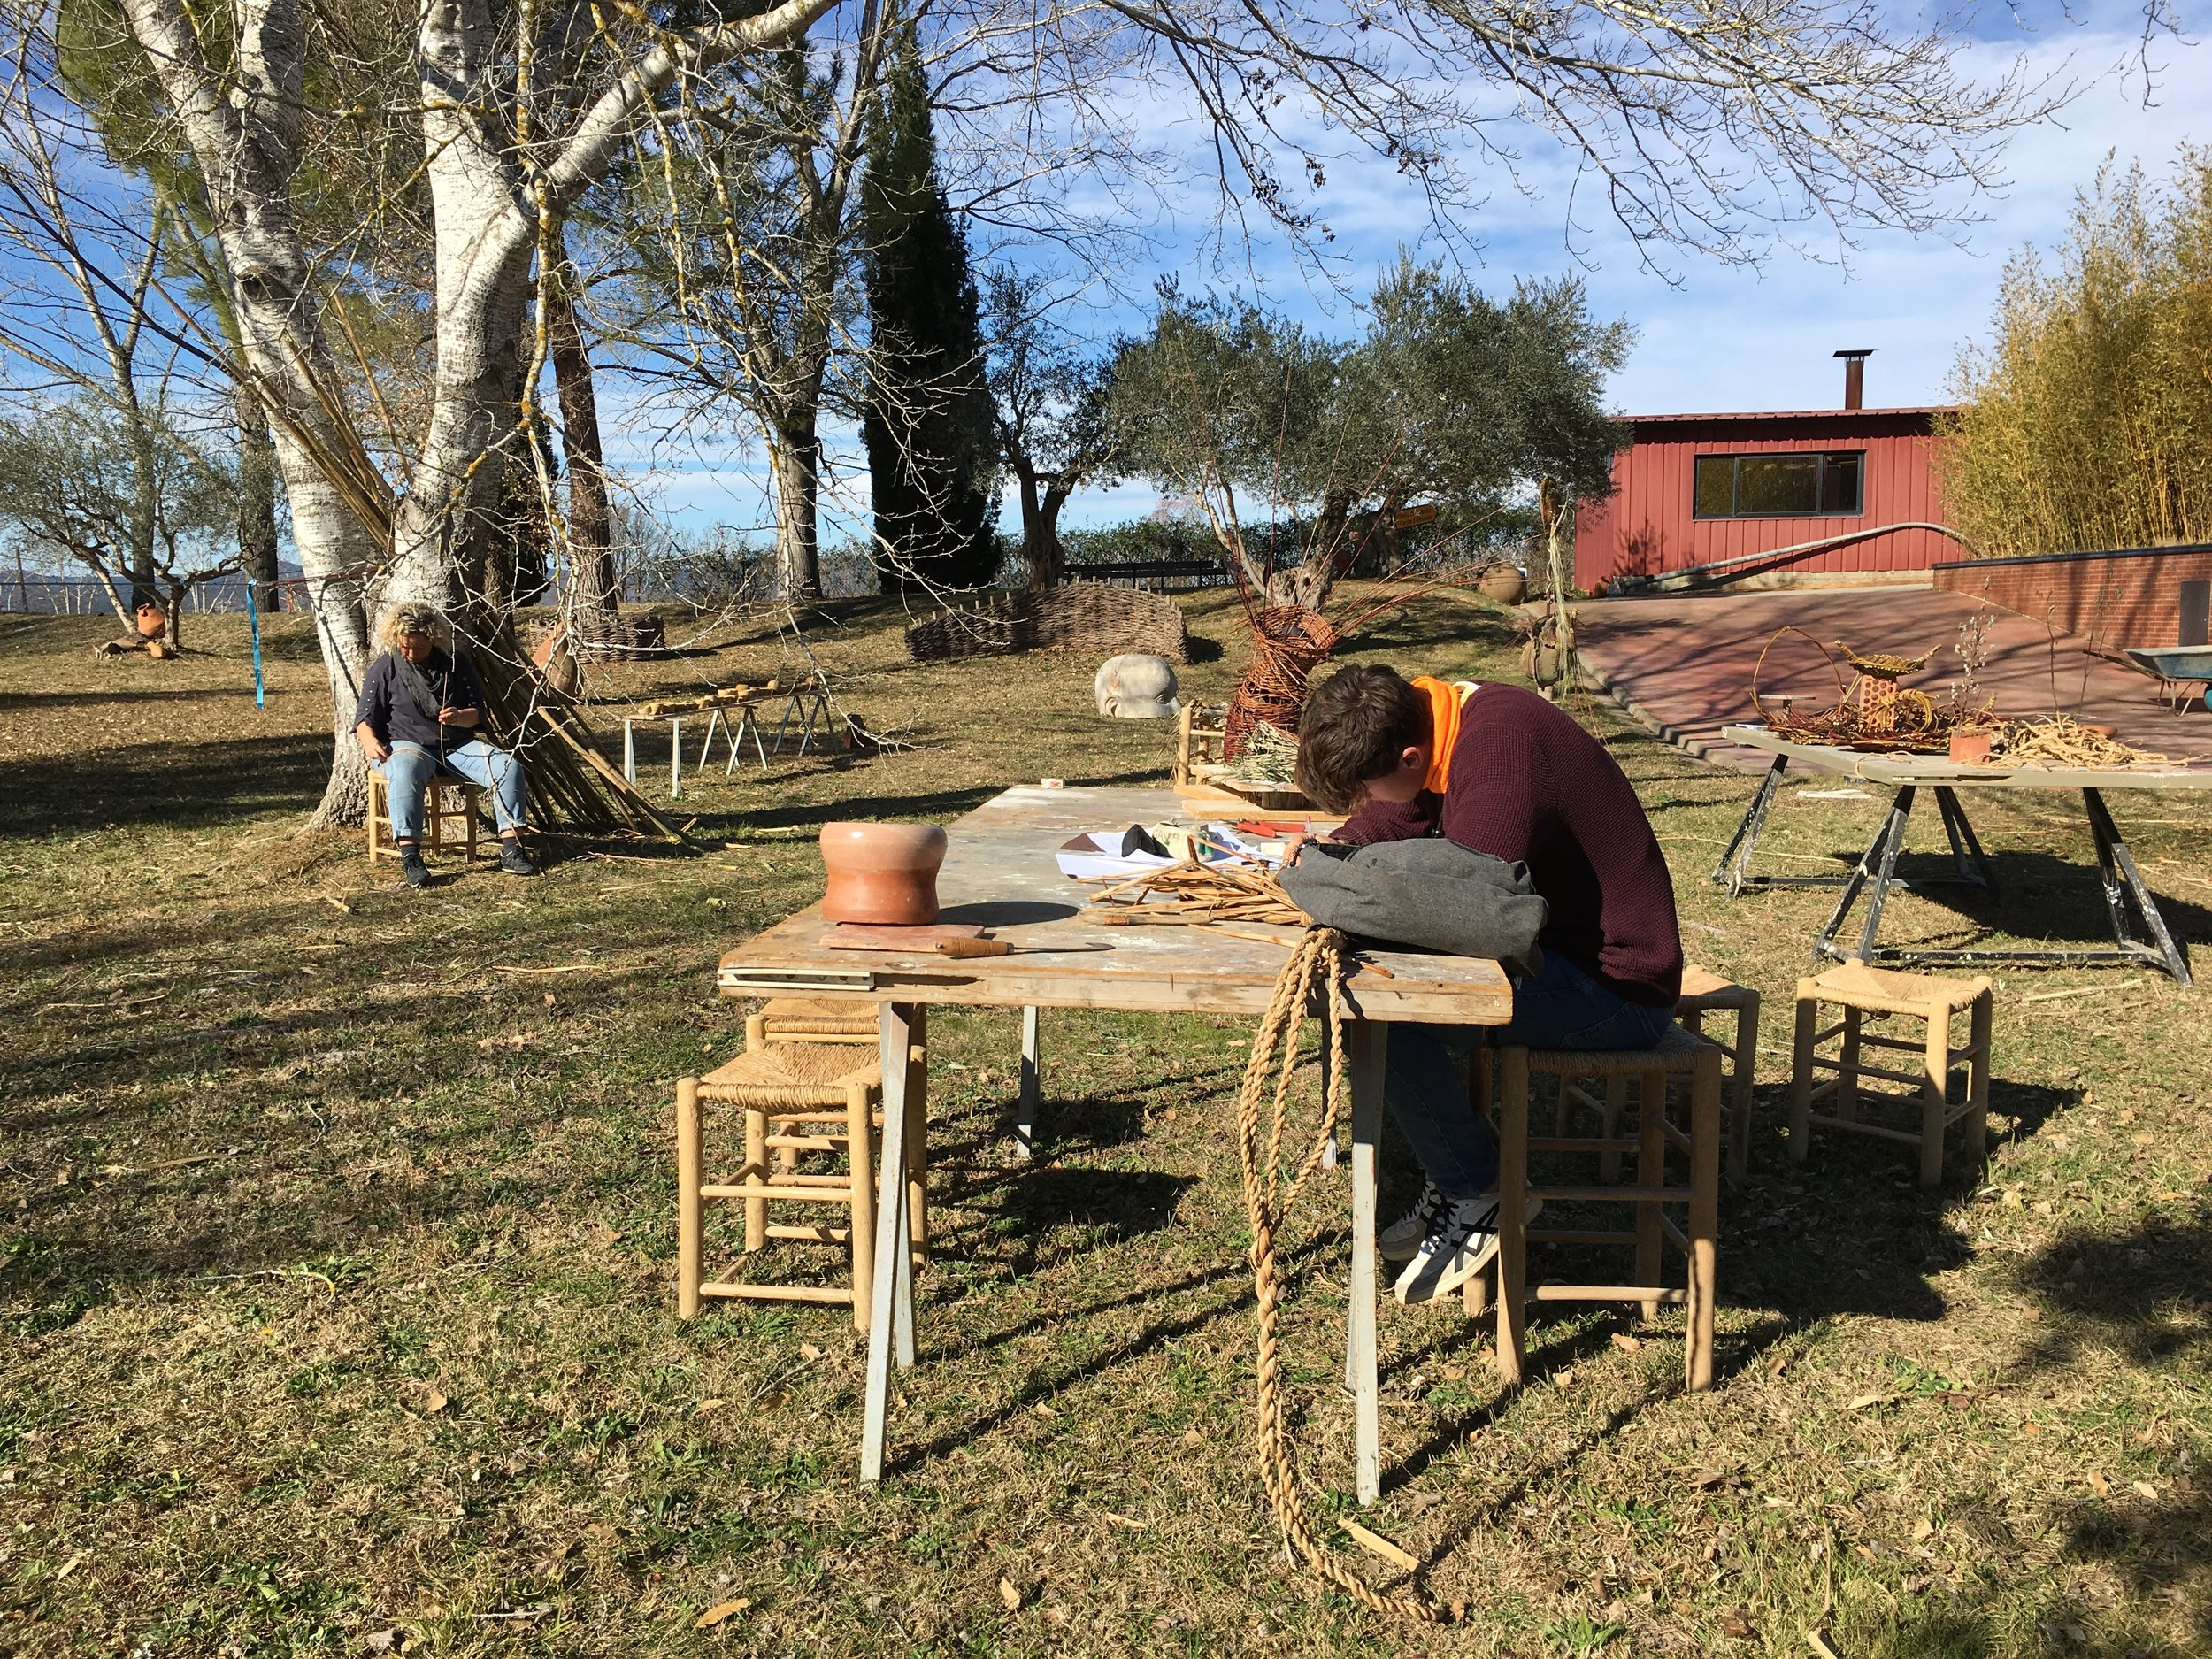 Elisava Base Camp 2018 Livingthinhgs Fibers 01.JPG